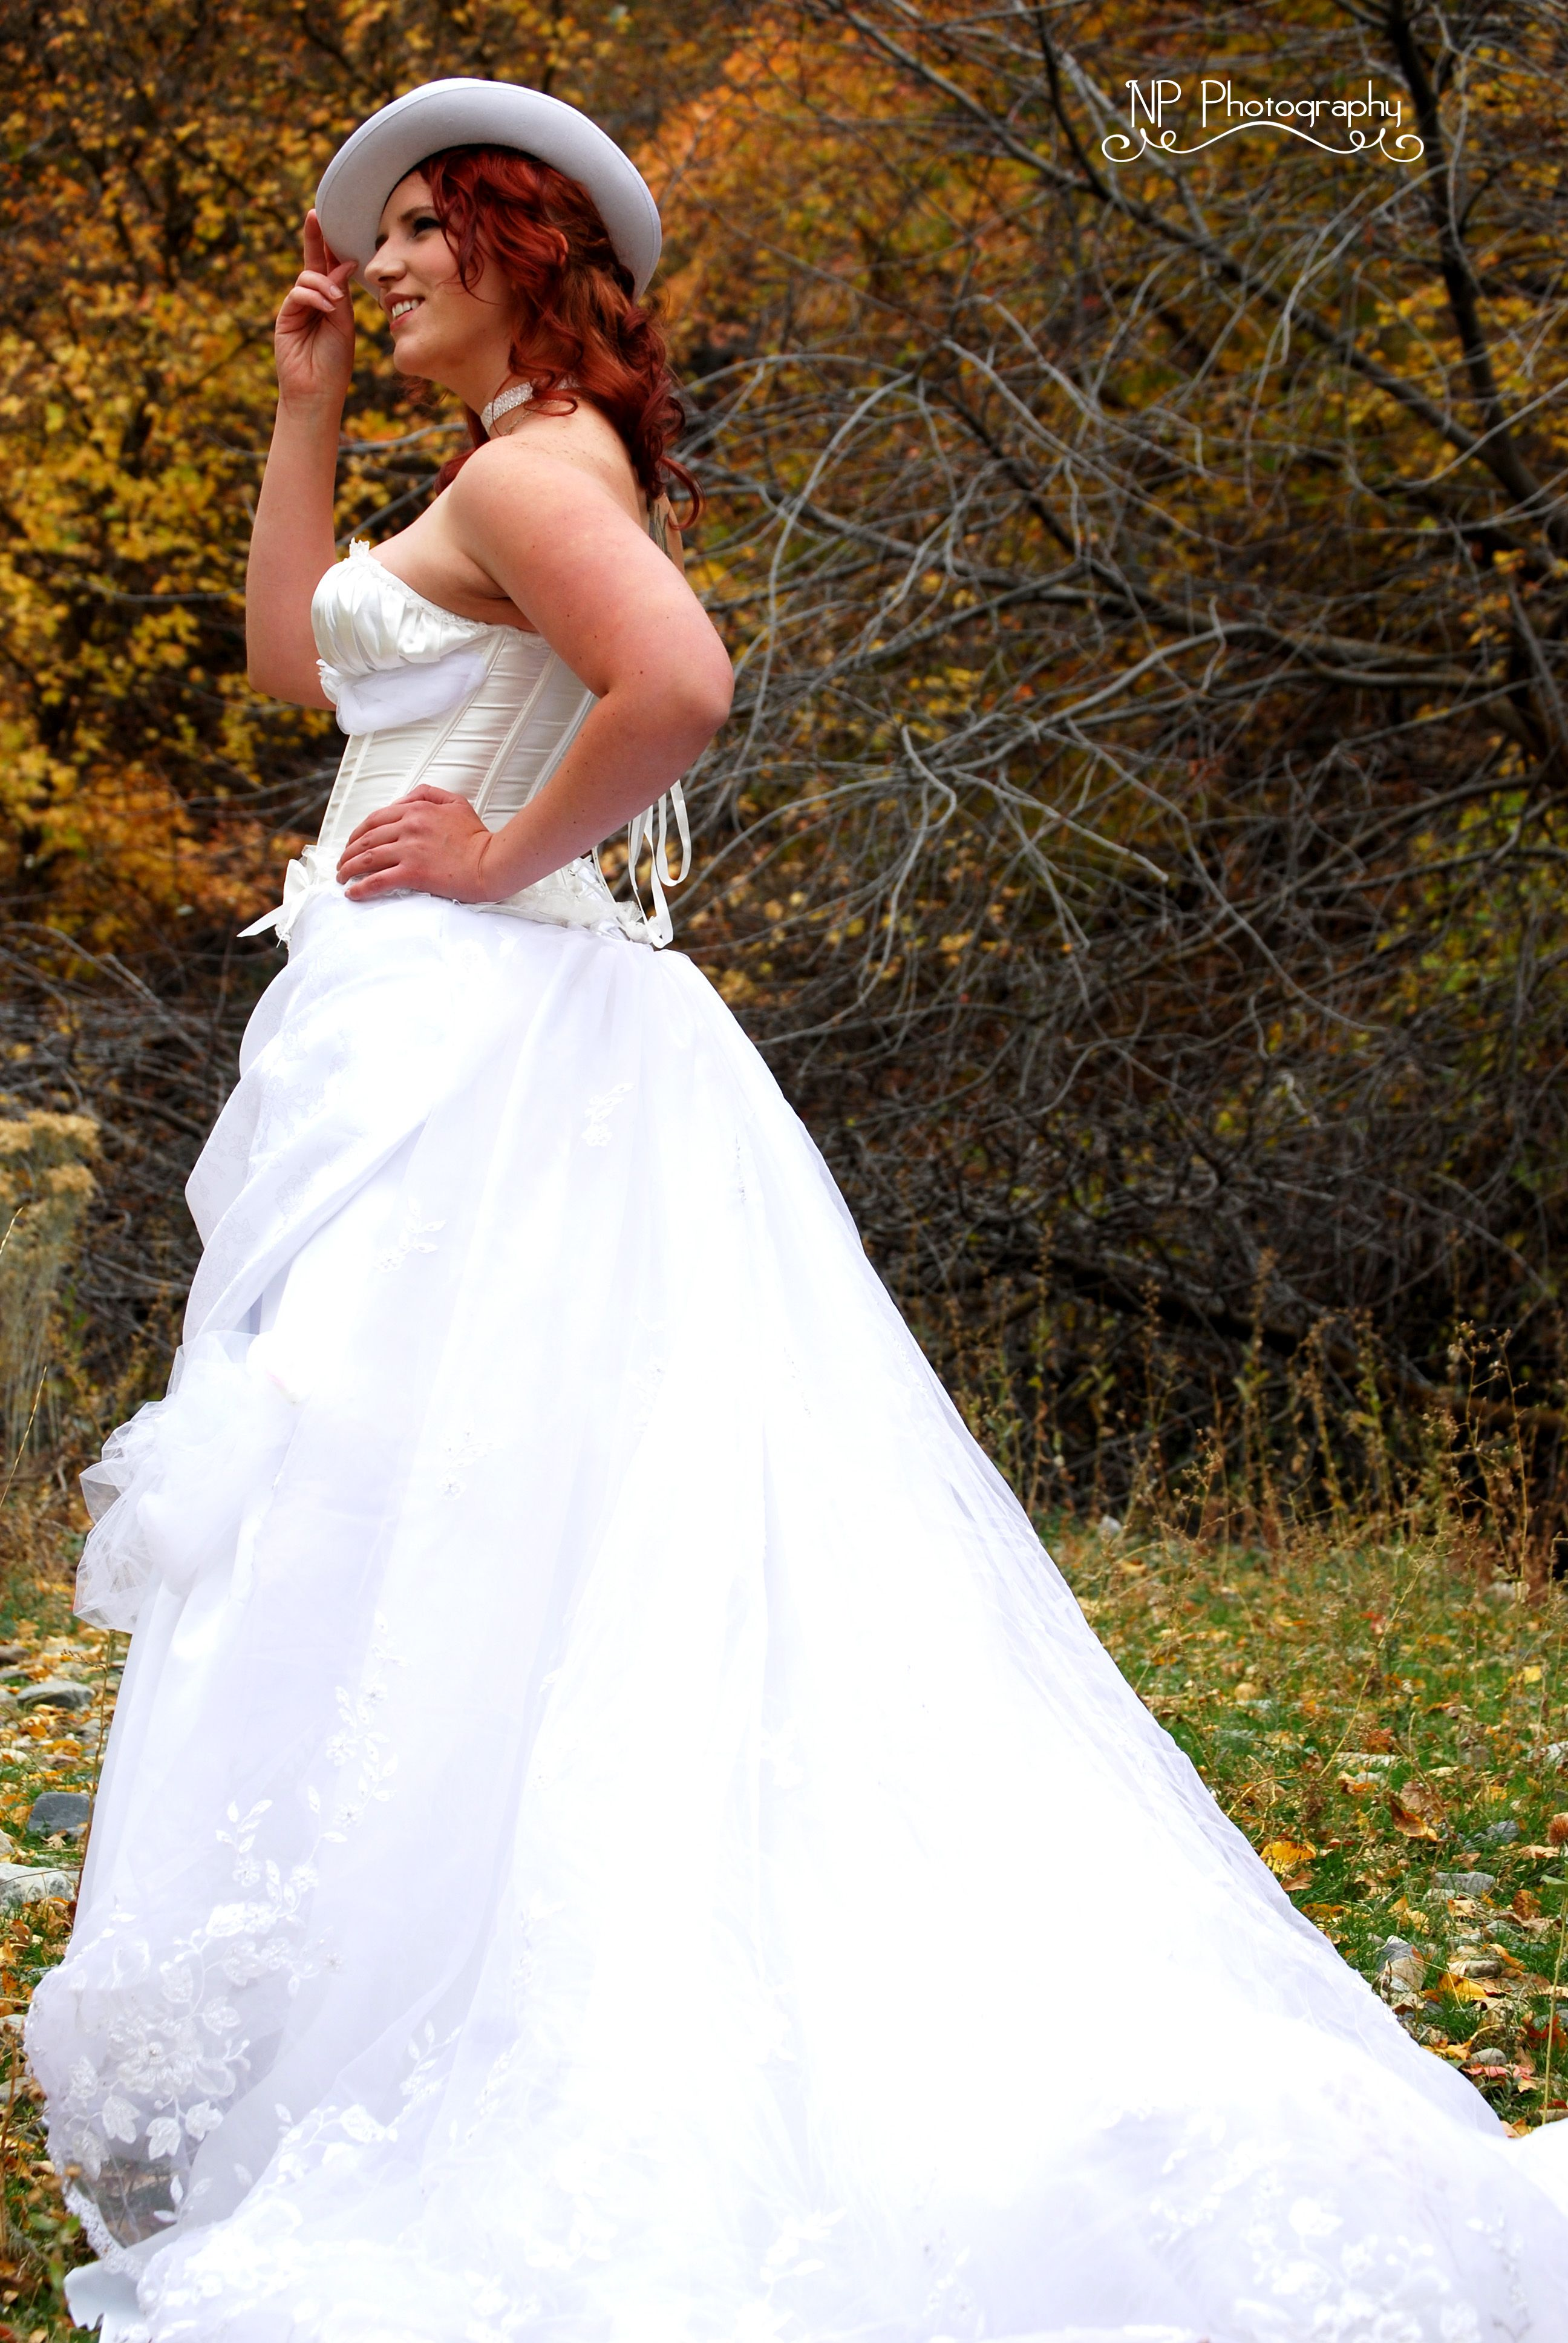 Steunk Wedding Dress White Gown Train Top Hat: Cool Steam Punk Wedding Dresses At Websimilar.org